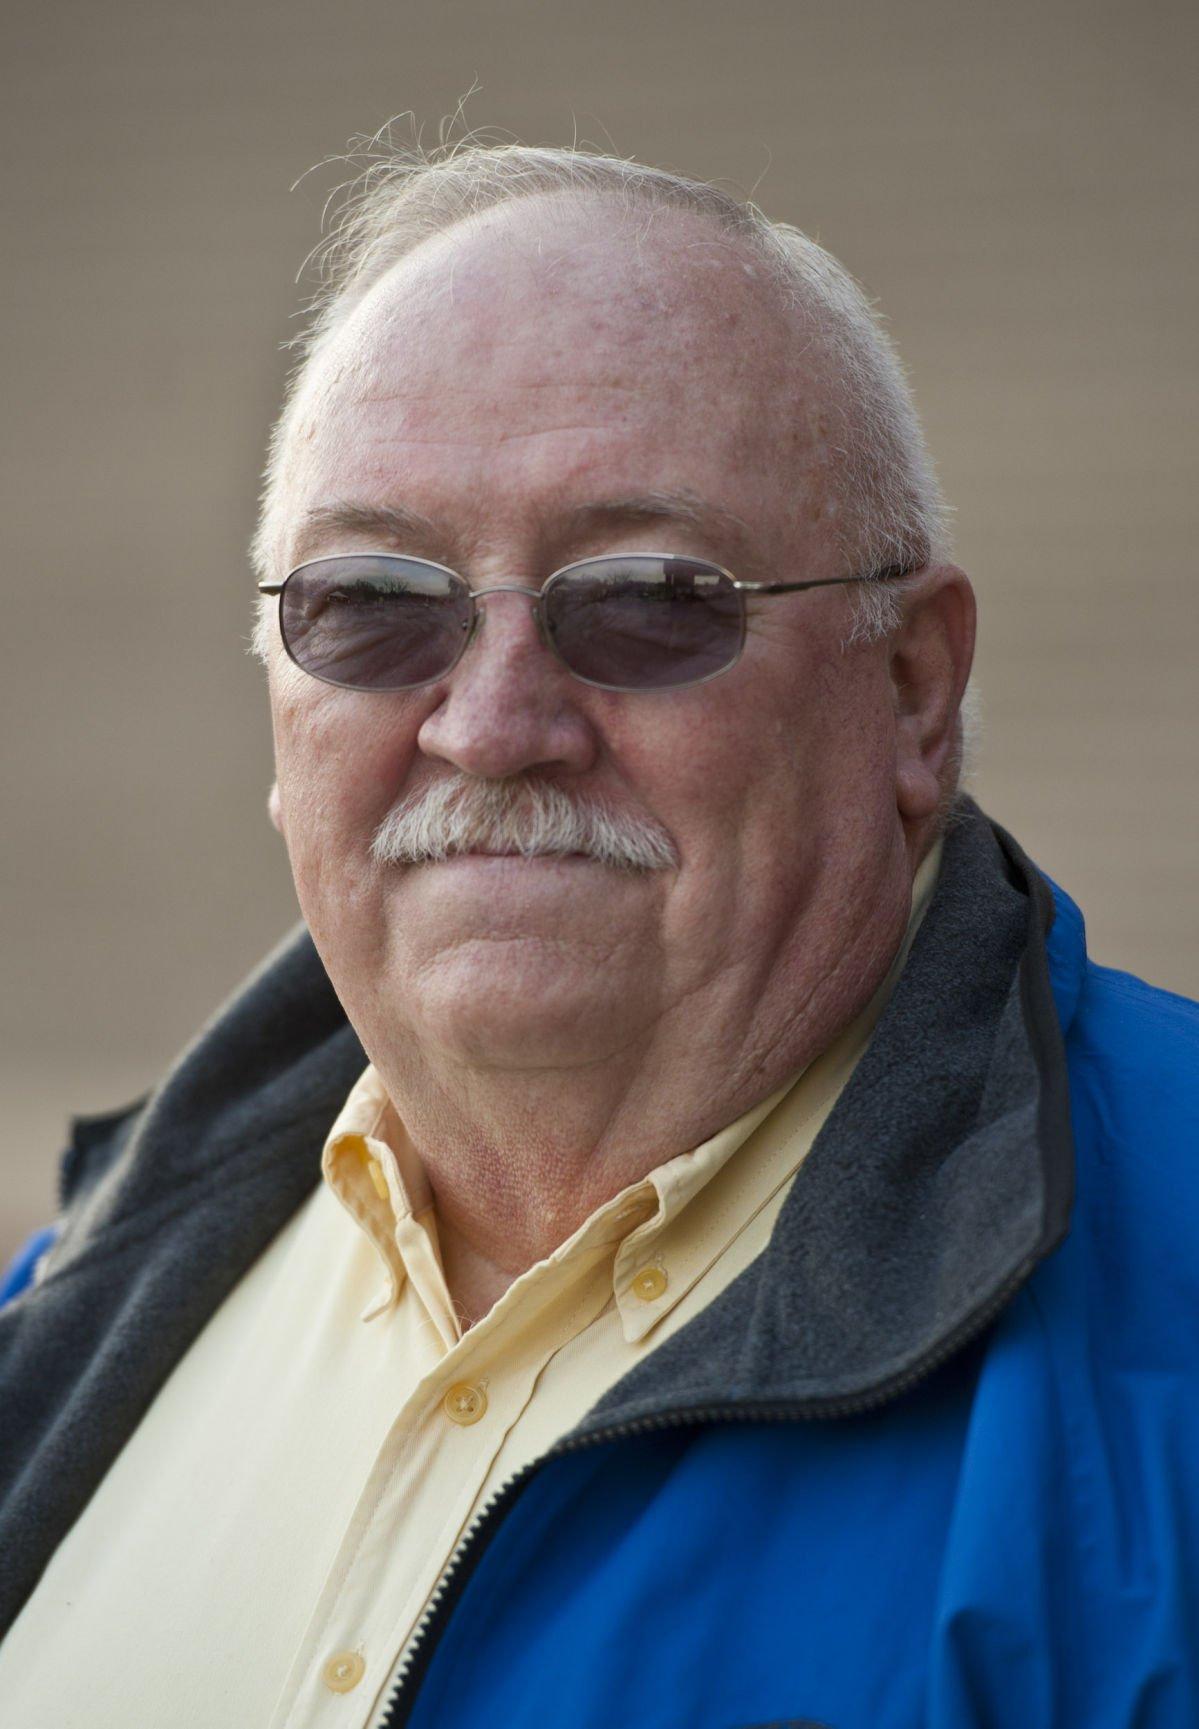 cheap labor local folks recall summer jobs news com larry kirby